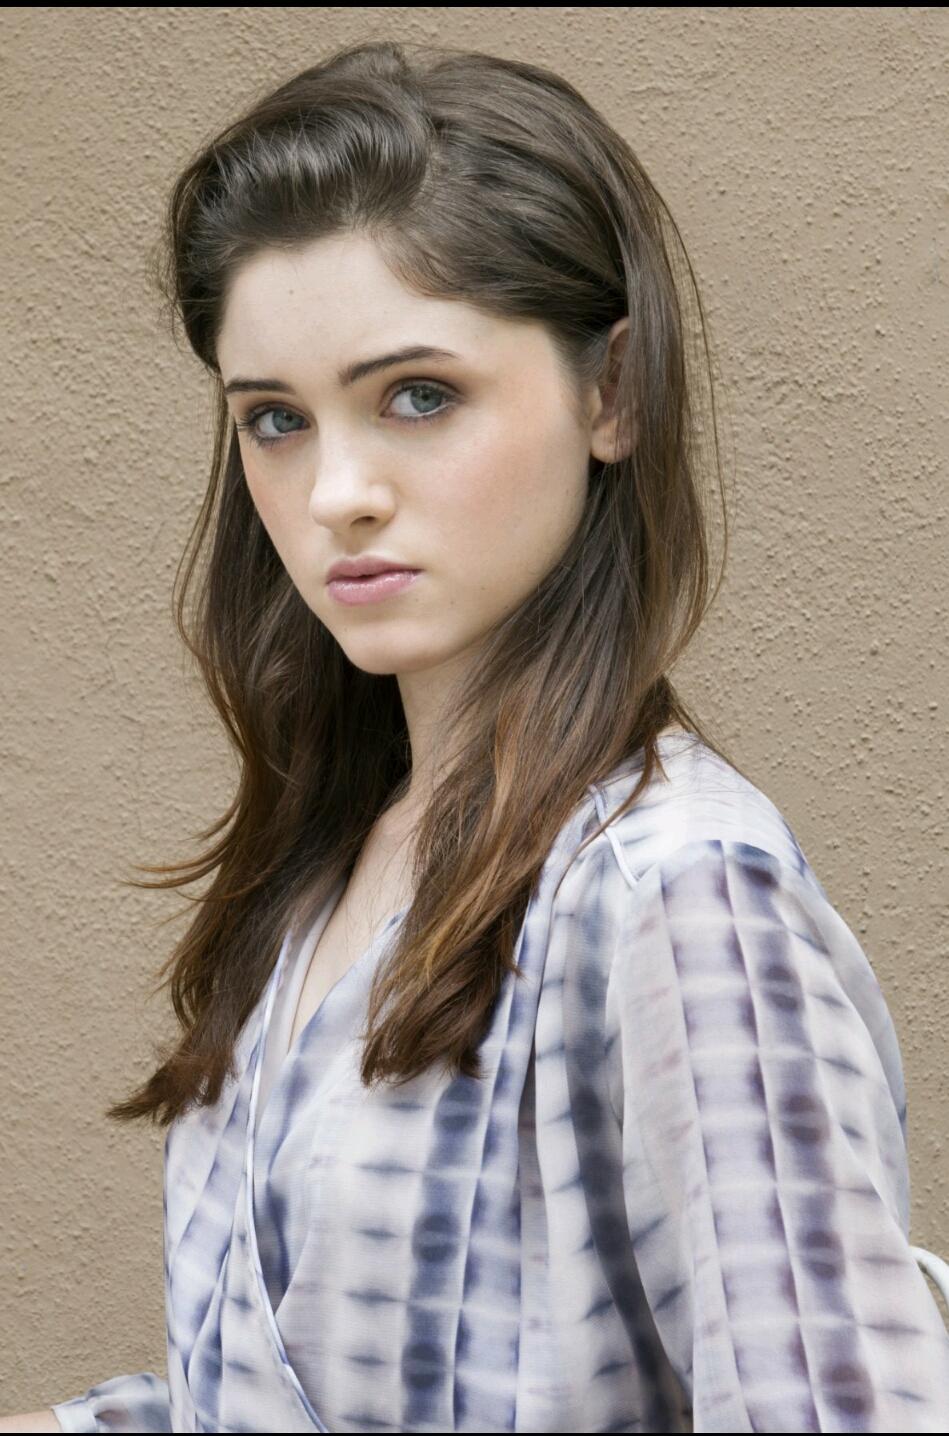 Image via: IMDb Natalia Dyer plays Nancy